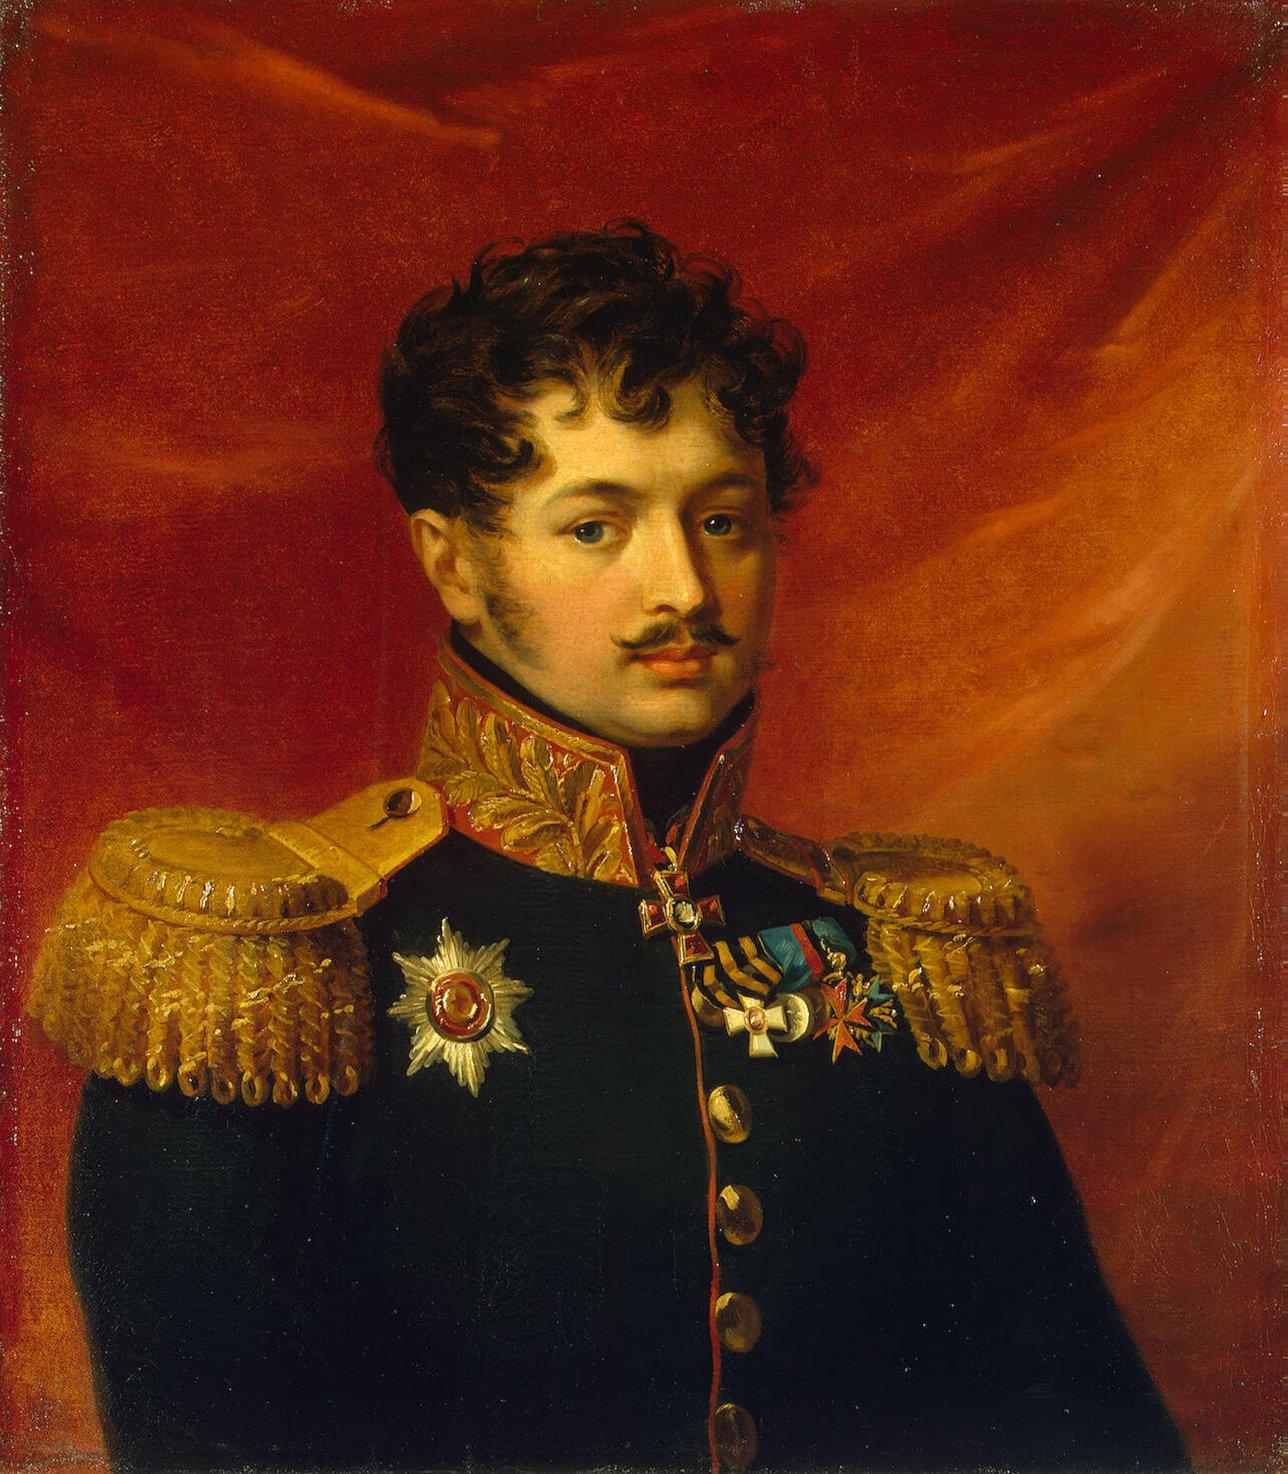 Загряжский, Пётр Петрович